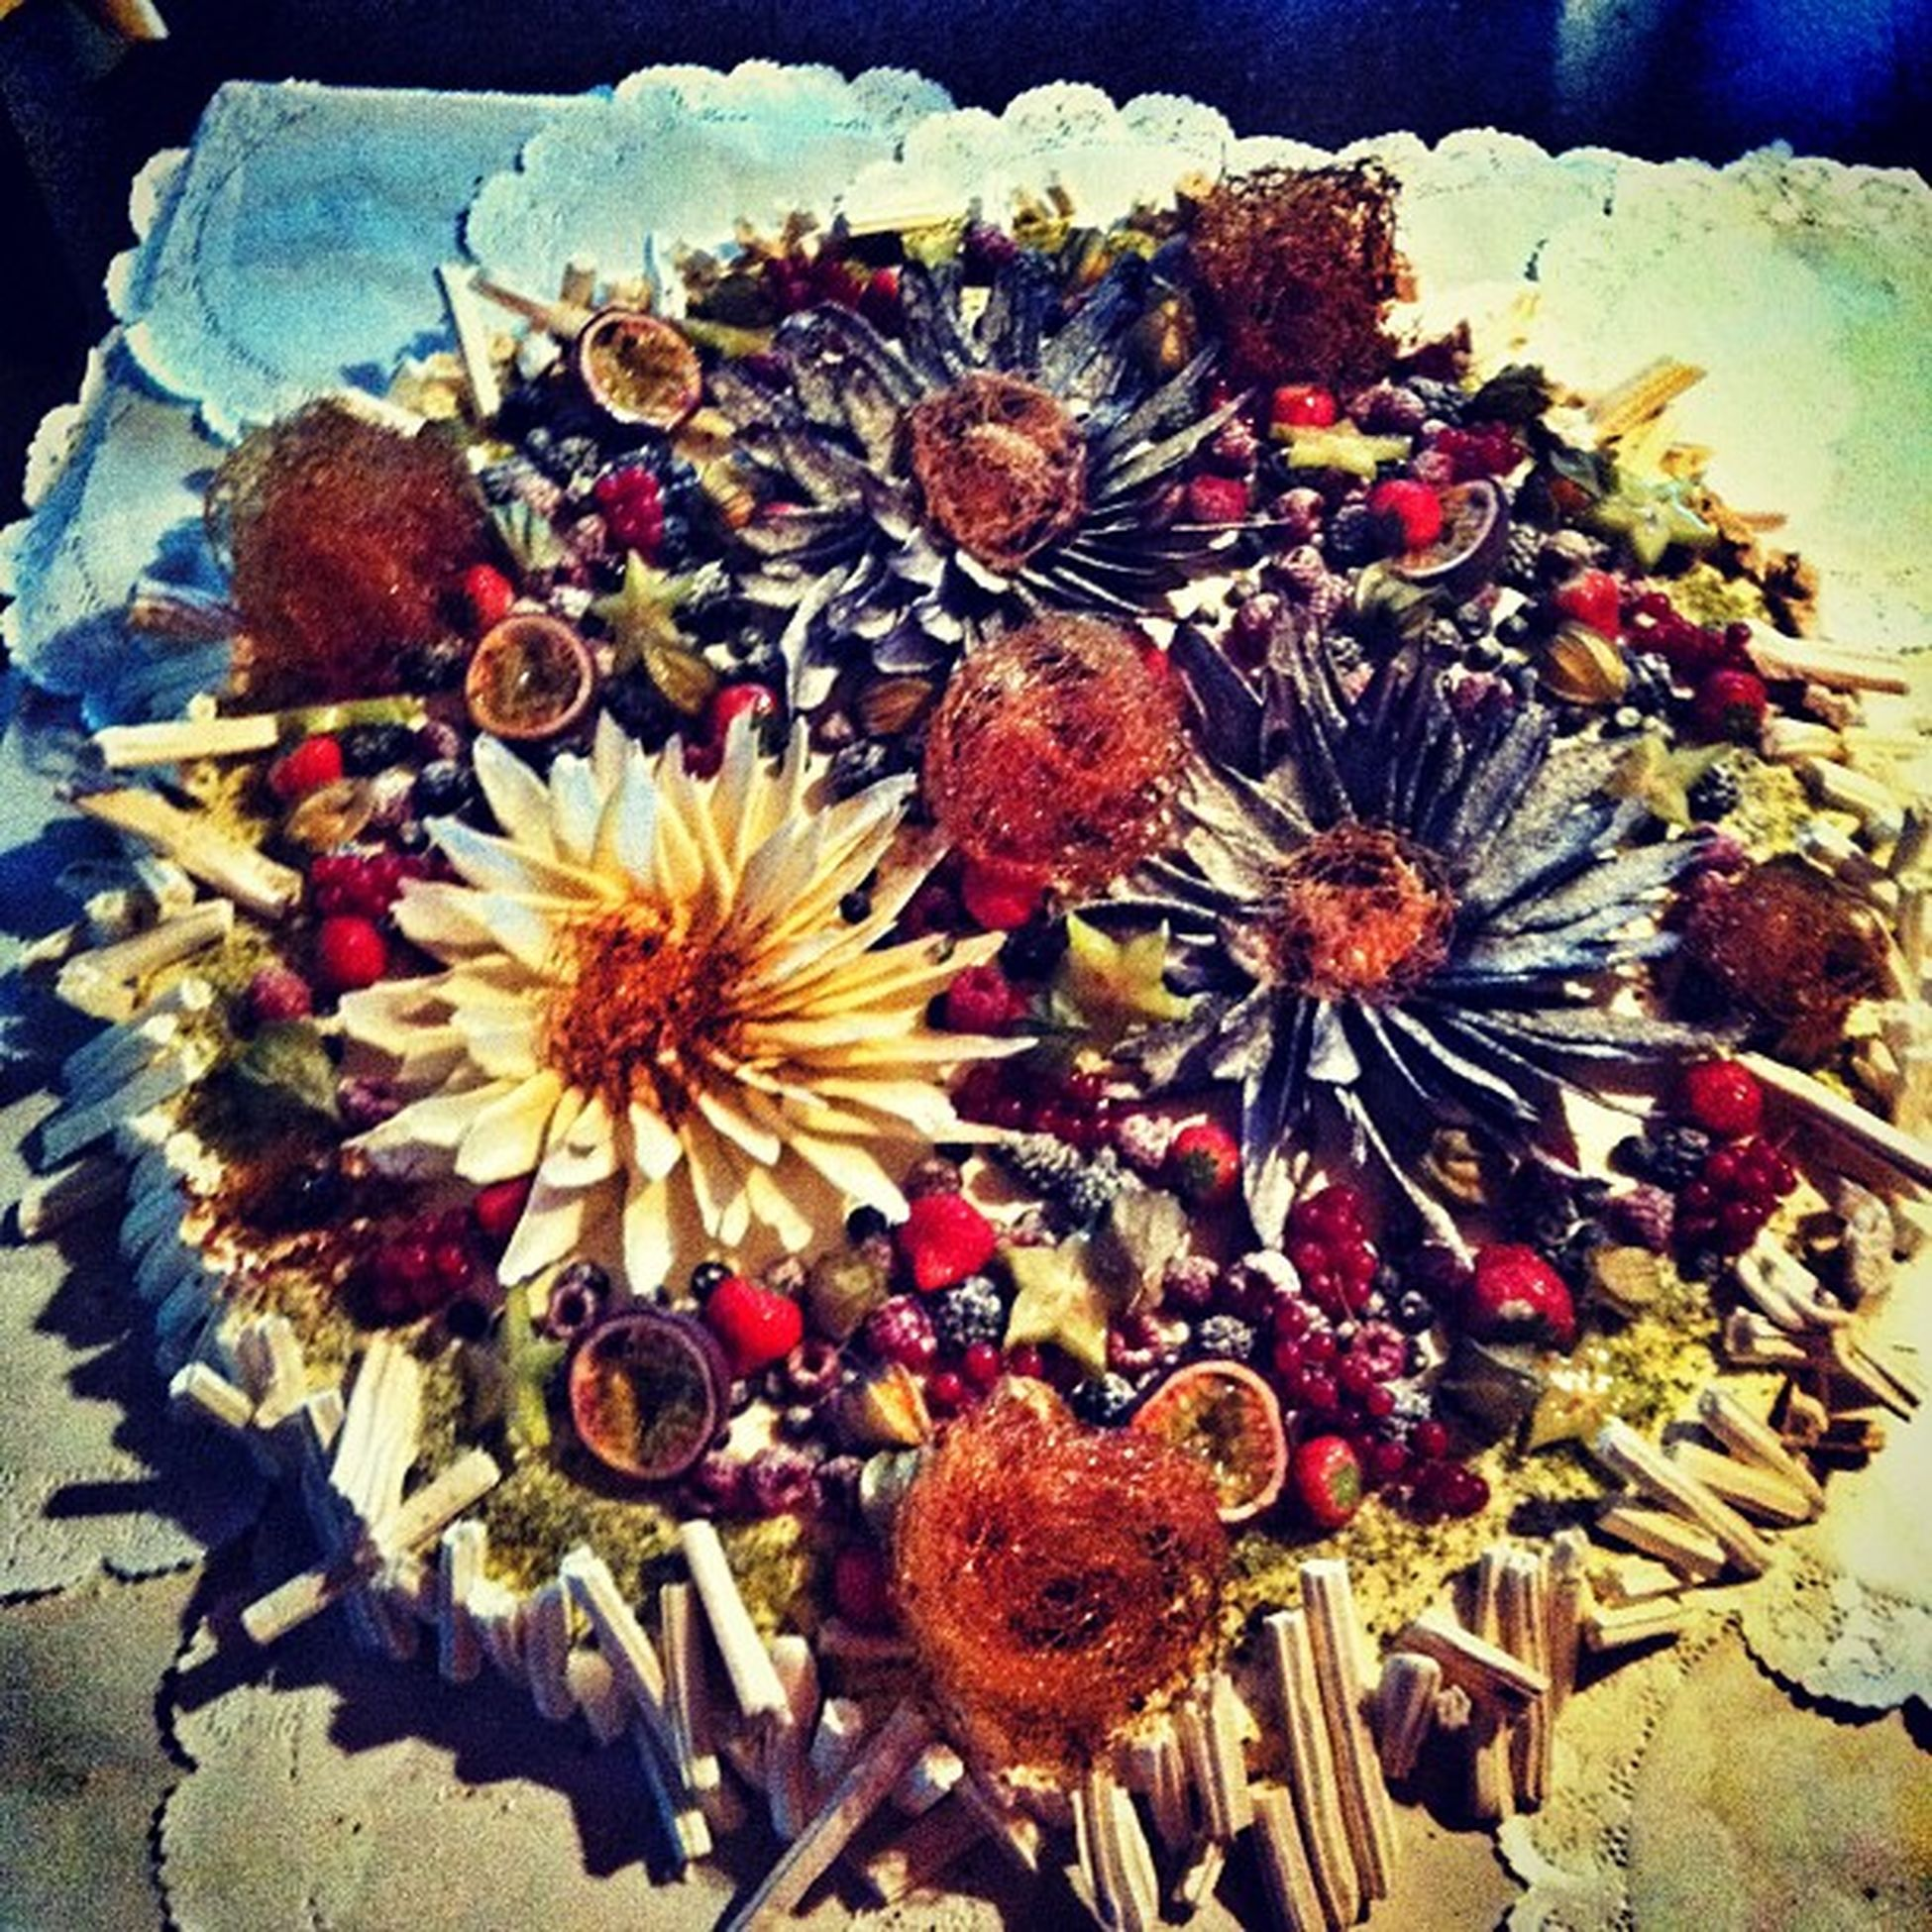 Best wedding cake ever :D